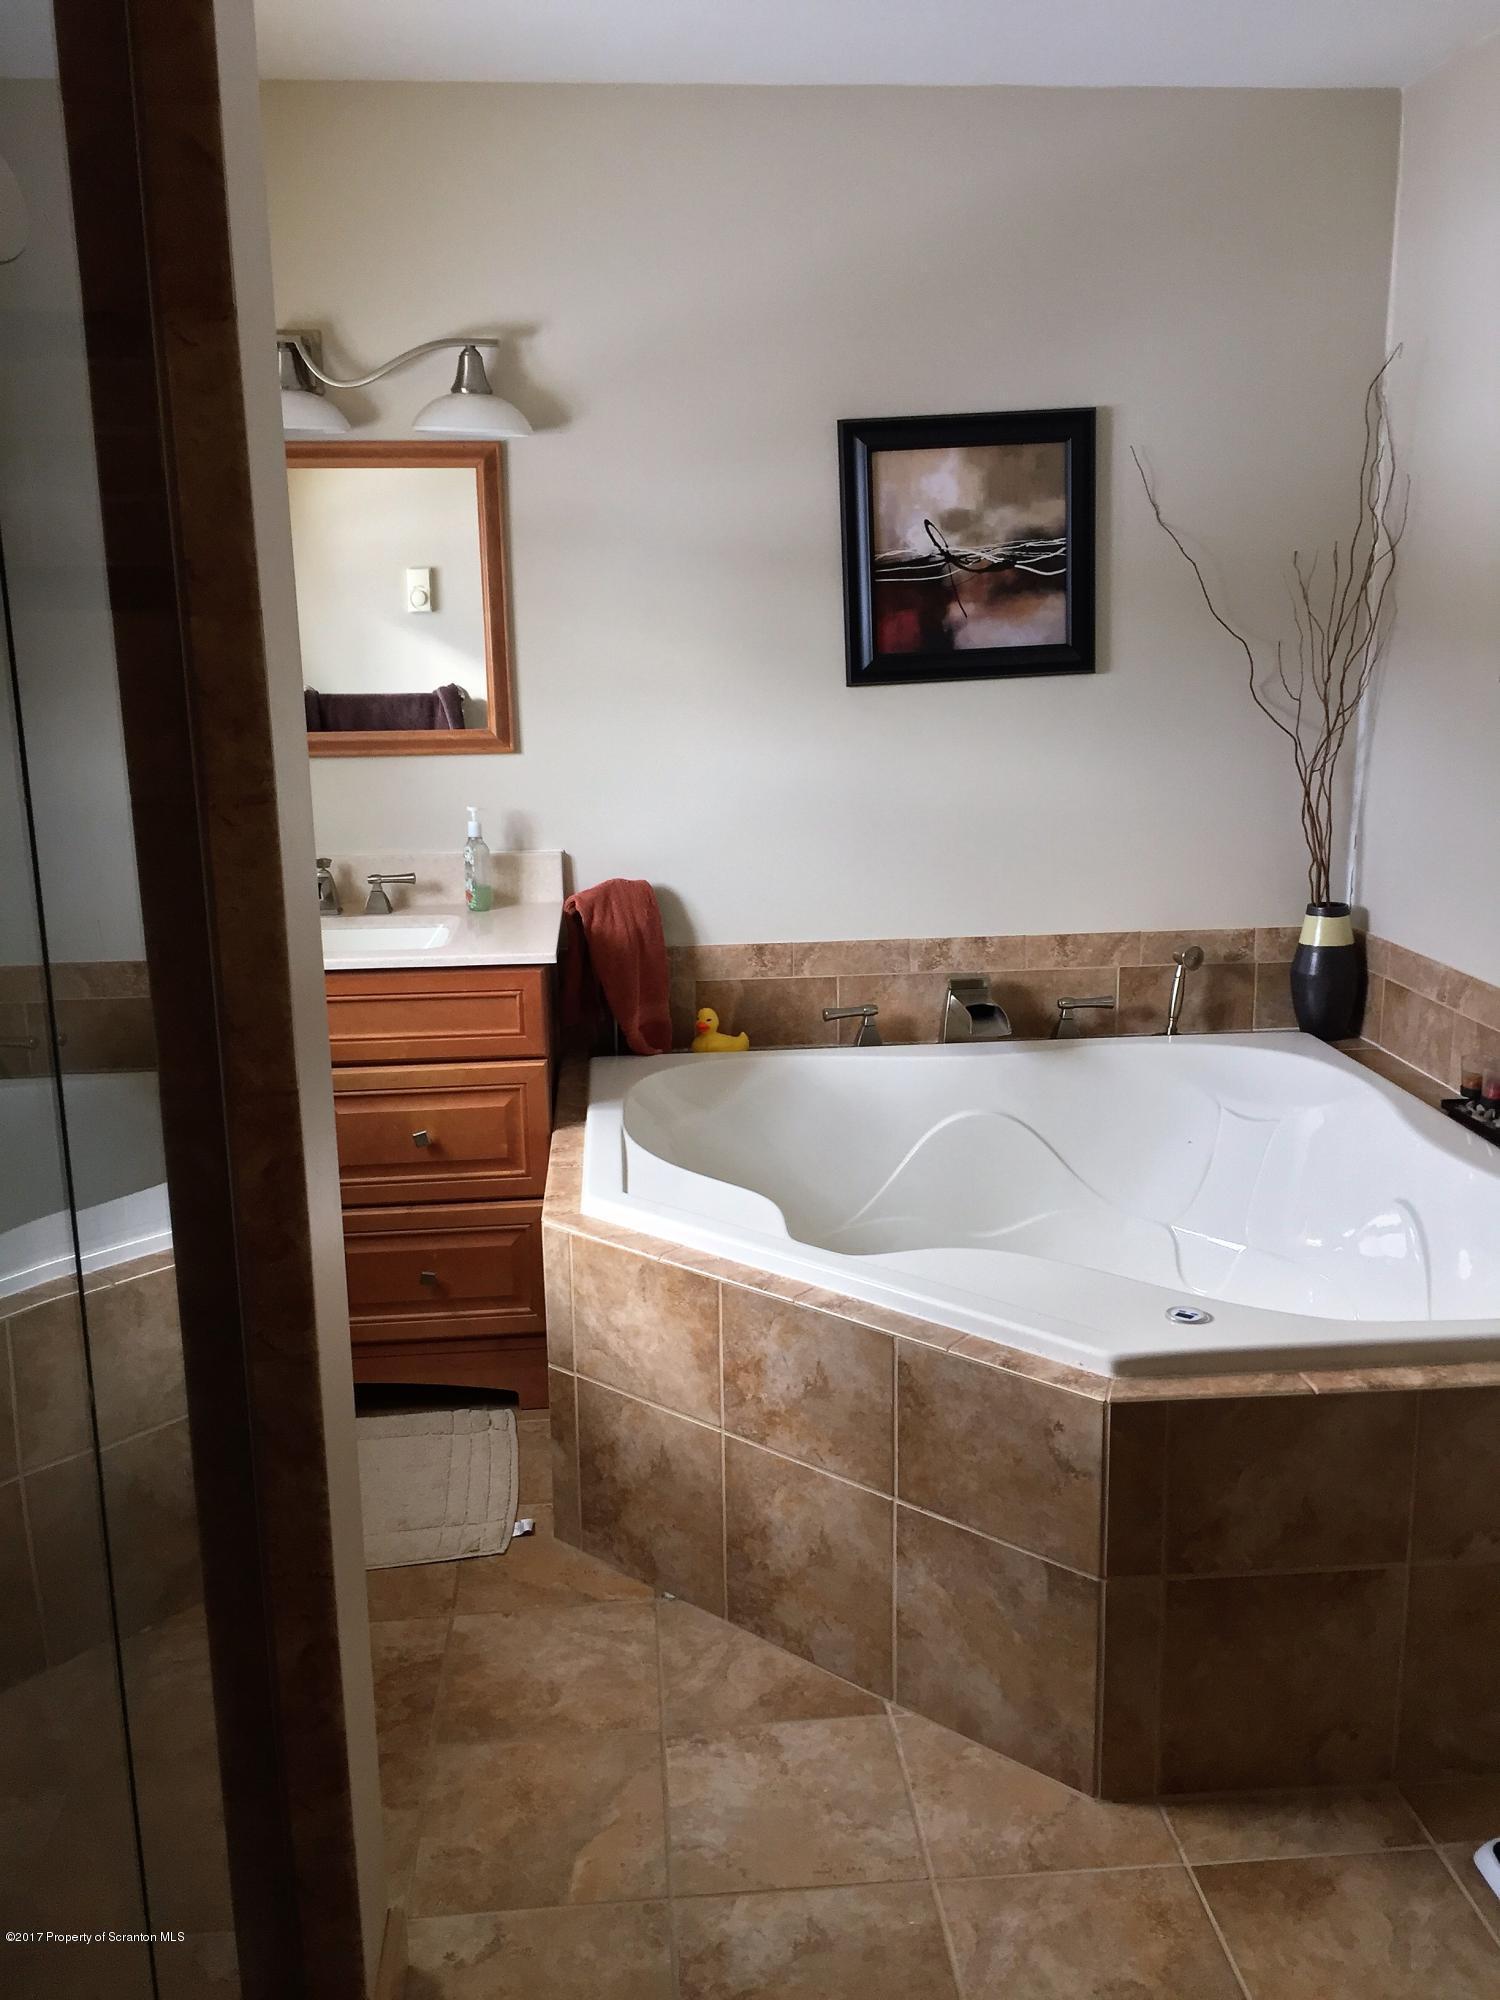 121 Baylor Rd, Nicholson, Pennsylvania 18446, 4 Bedrooms Bedrooms, 8 Rooms Rooms,3 BathroomsBathrooms,Single Family,For Sale,Baylor,20-3460